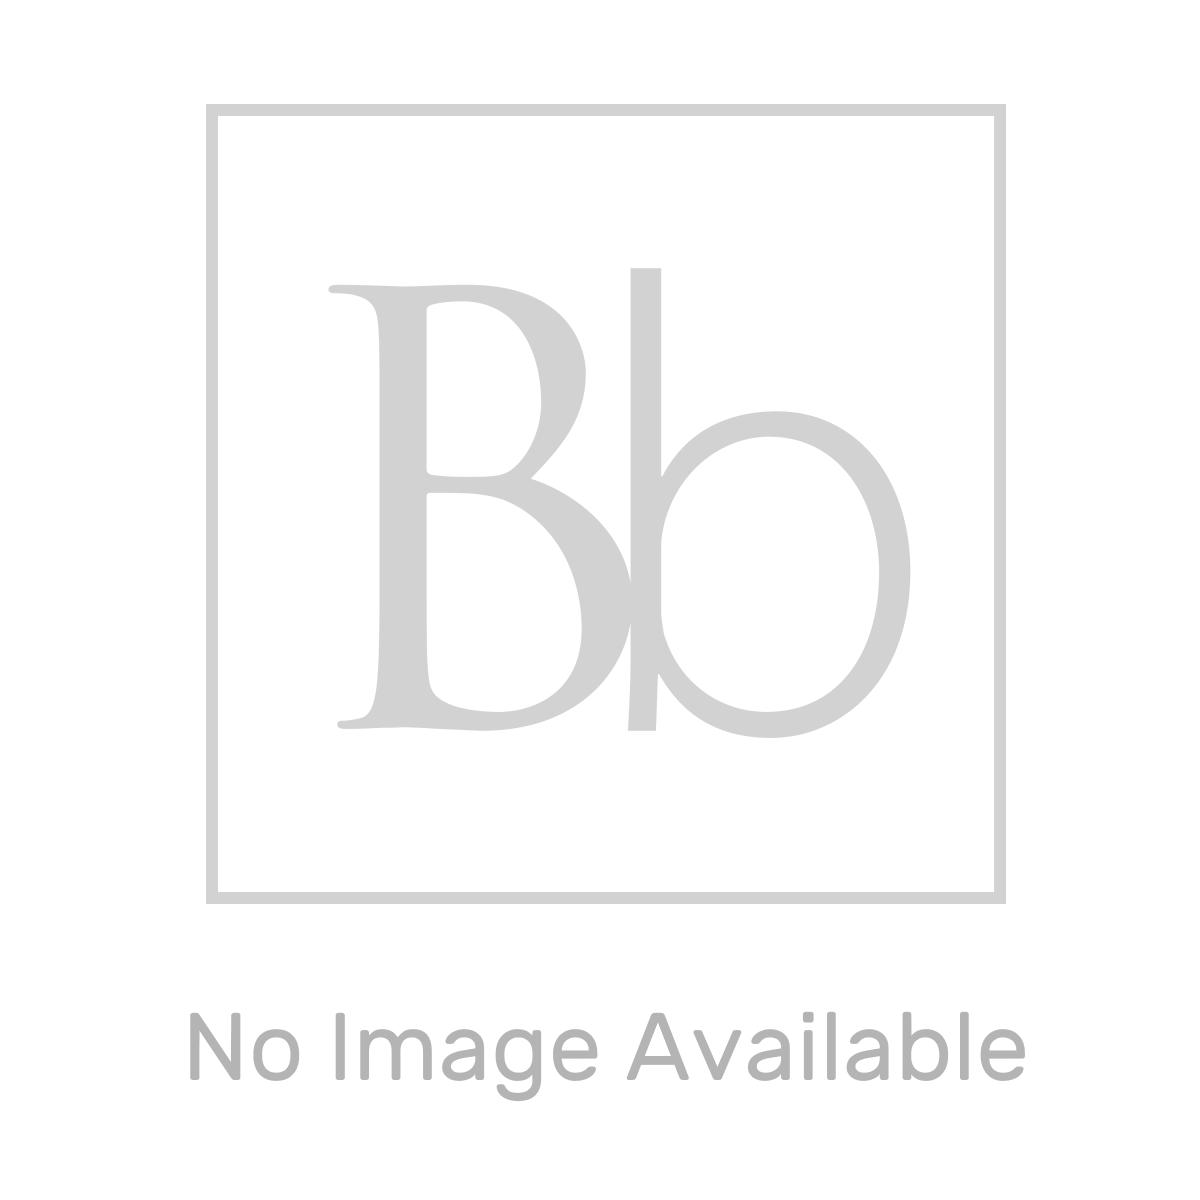 Croydex Stainless Steel Medium Two Tier Corner Basket